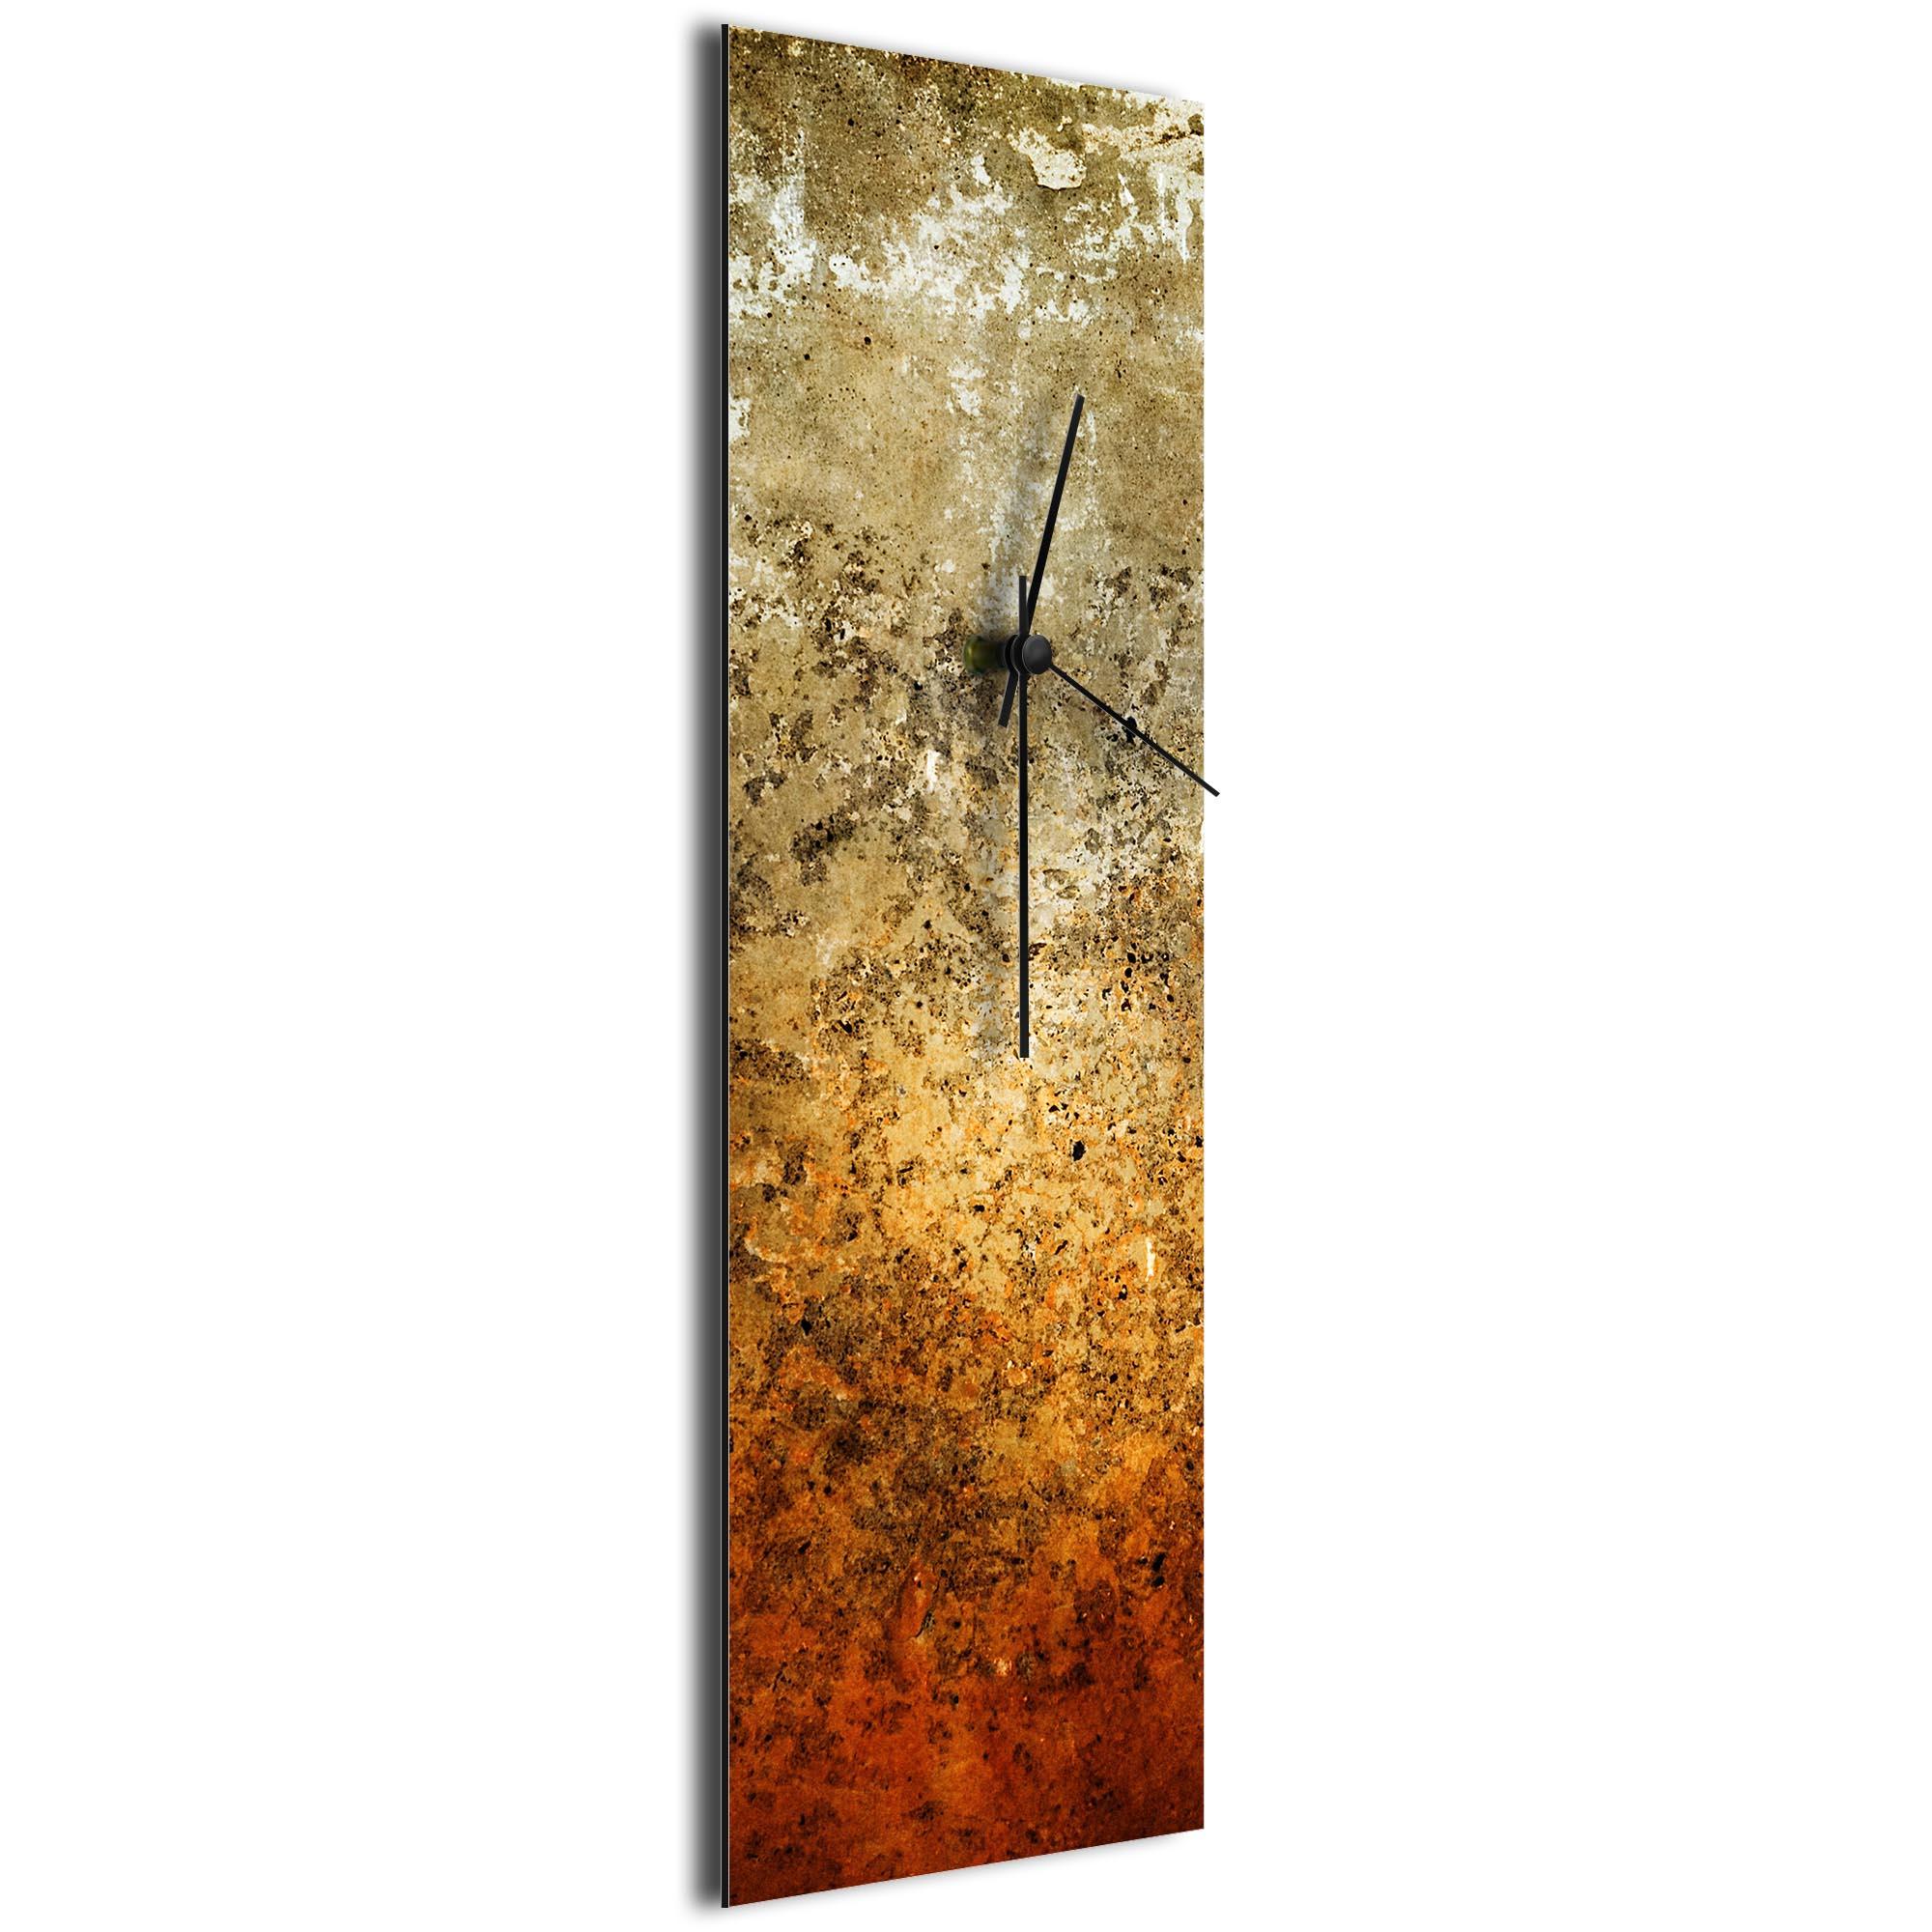 Sentinal Clock v1 by NAY - Distressed Modern Wall Clock - Image 2